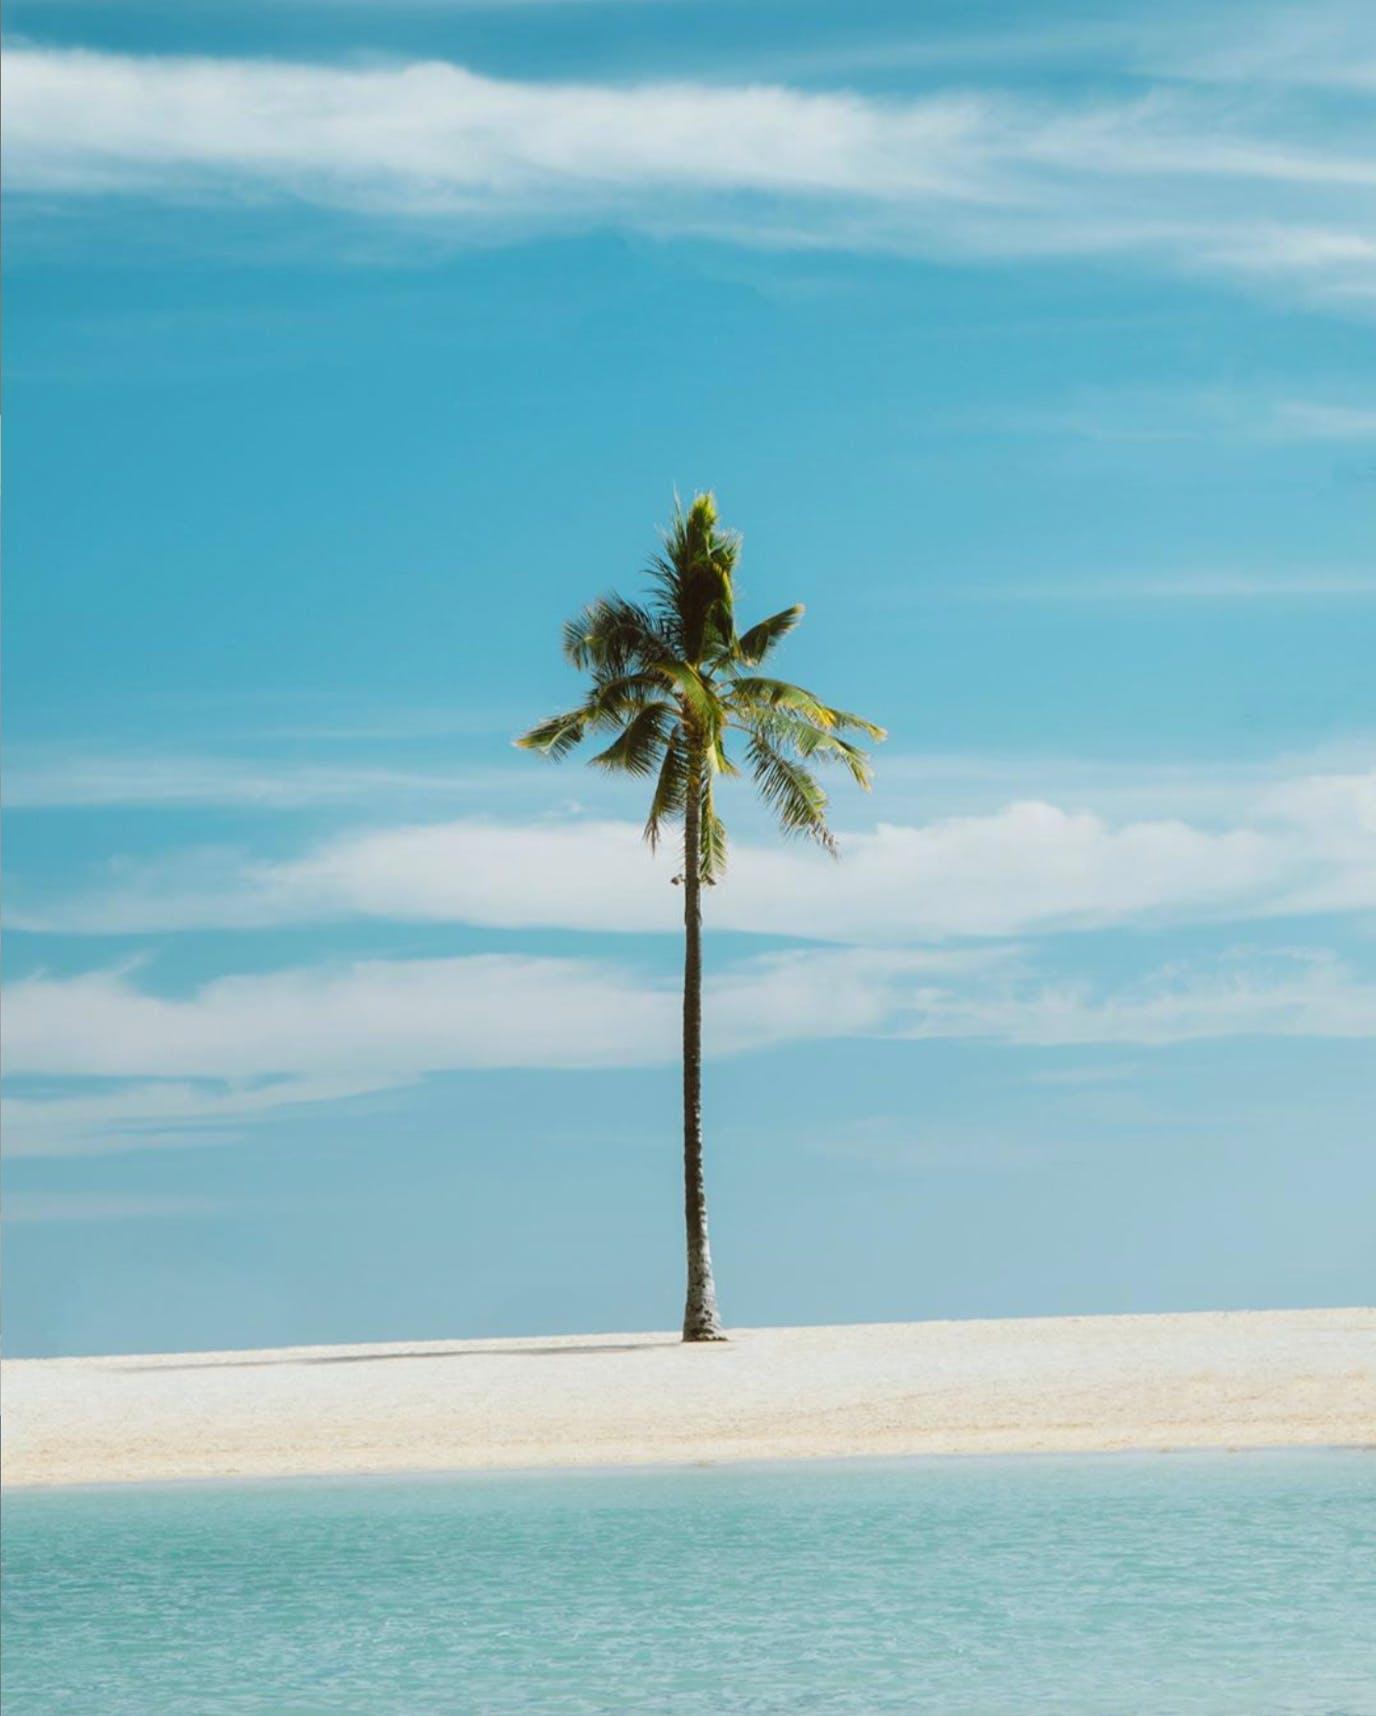 Hilton Lagoon & Palm Tree